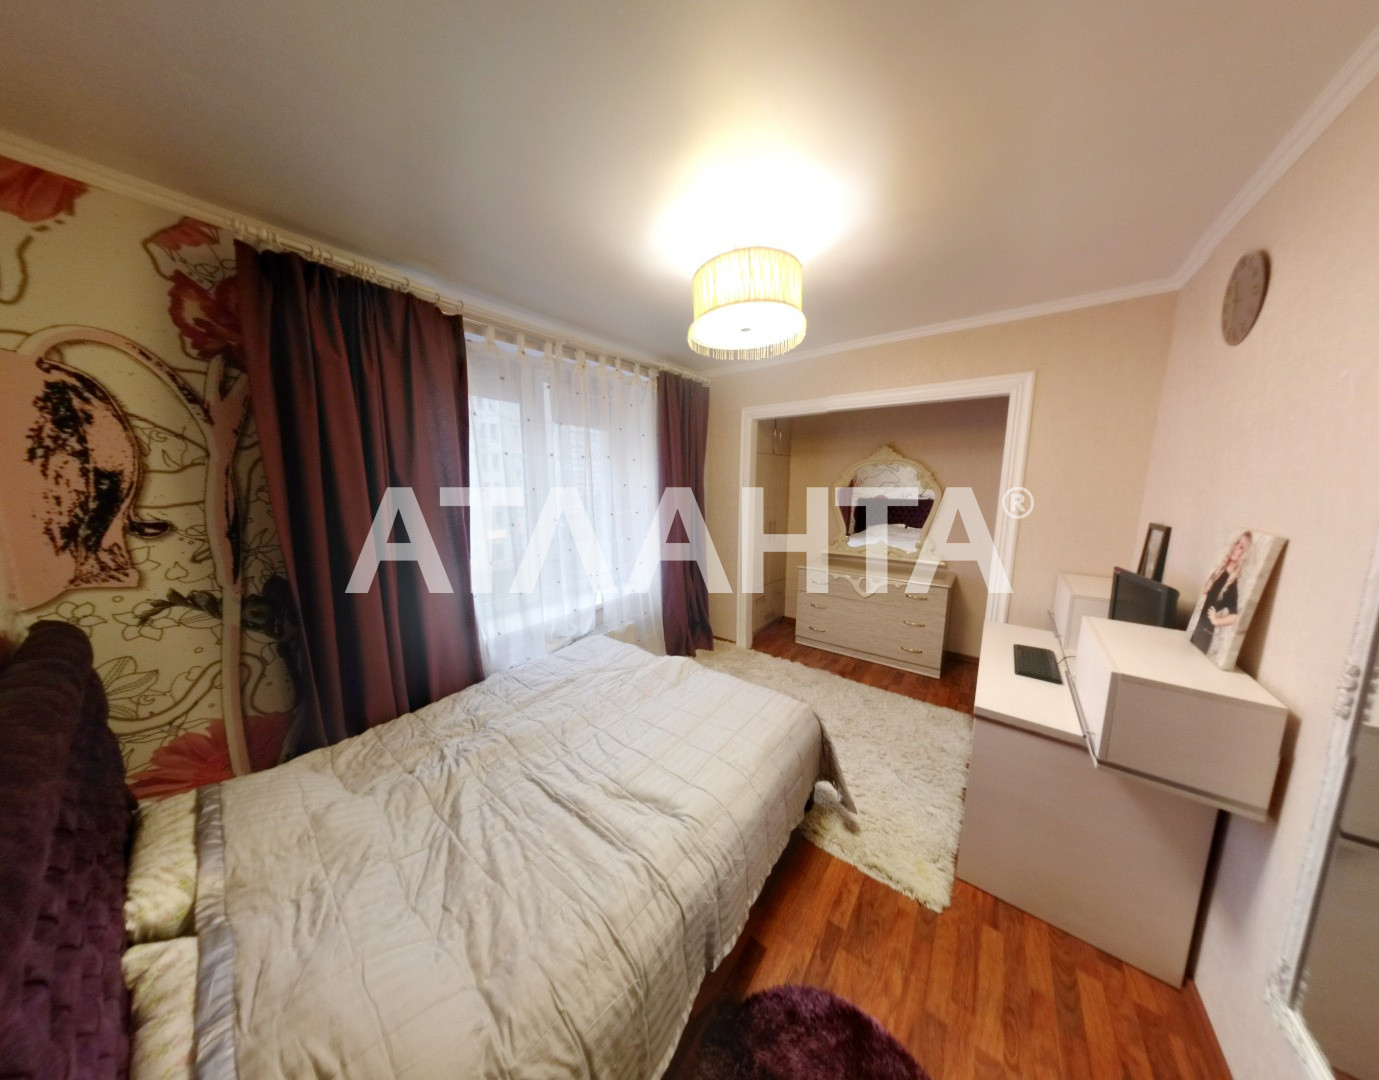 Продается 3-комнатная Квартира на ул. Ул. Ломоносова — 139 600 у.е. (фото №13)